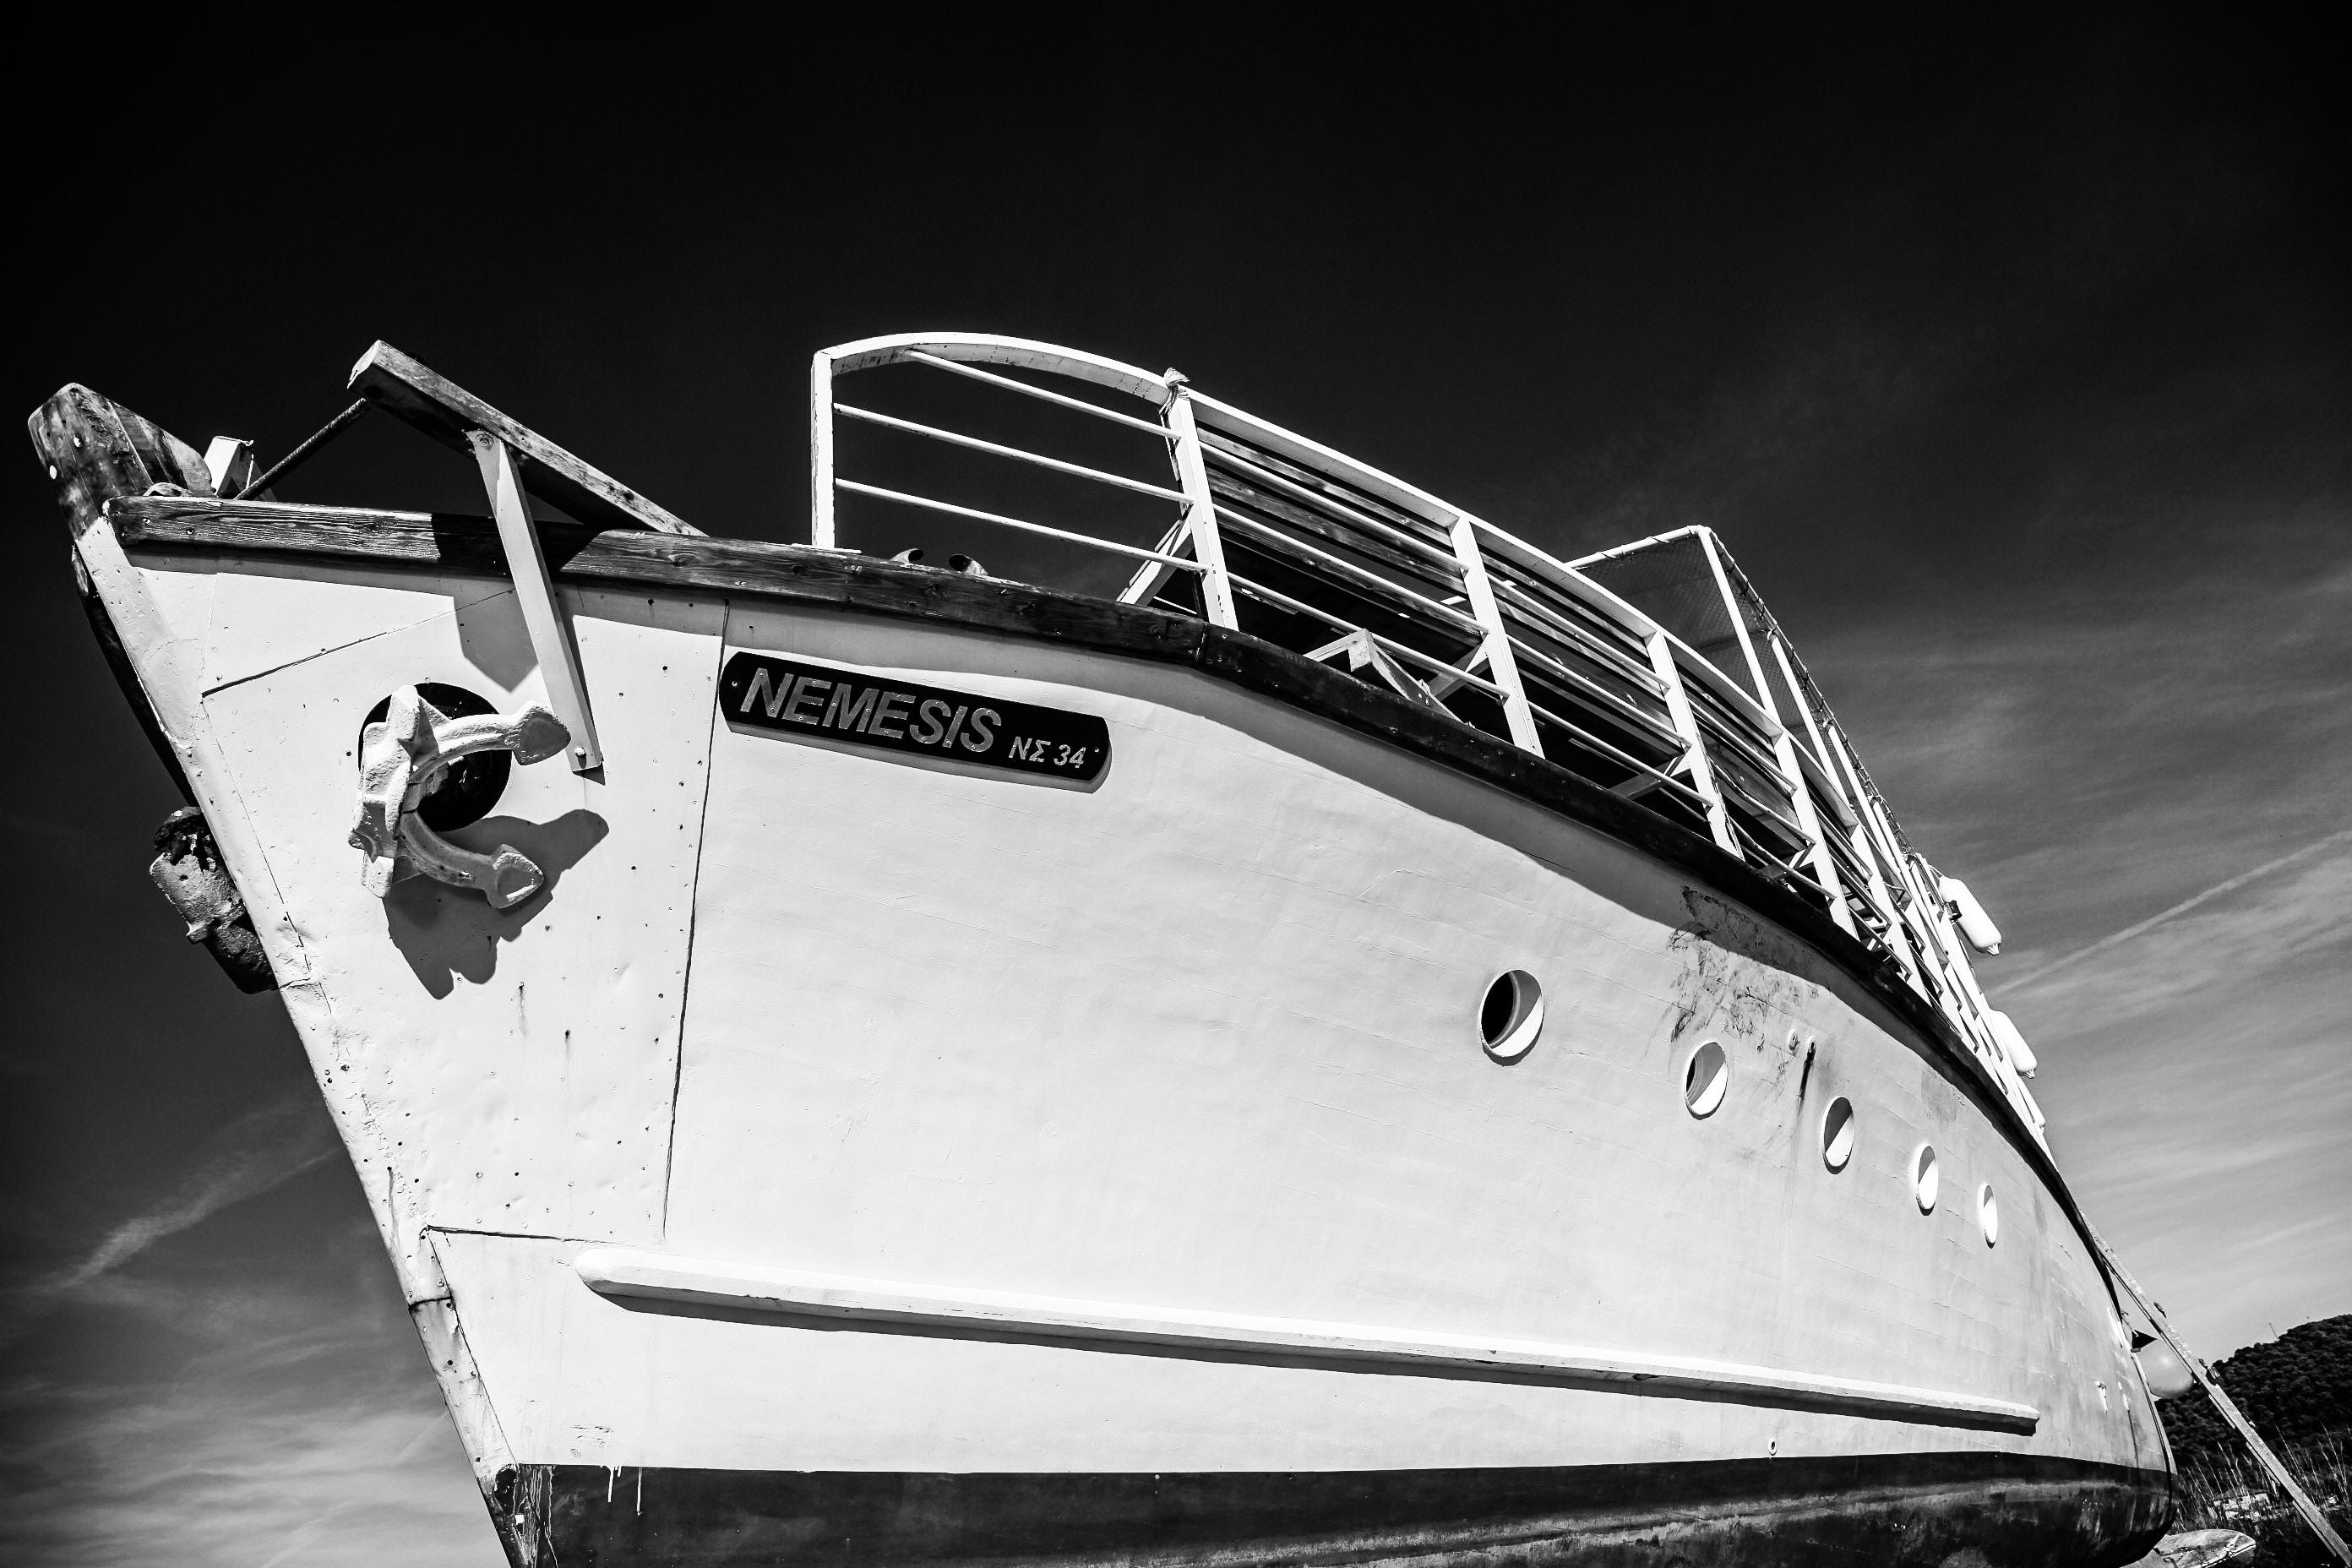 Nemesis ship on grayscale photography